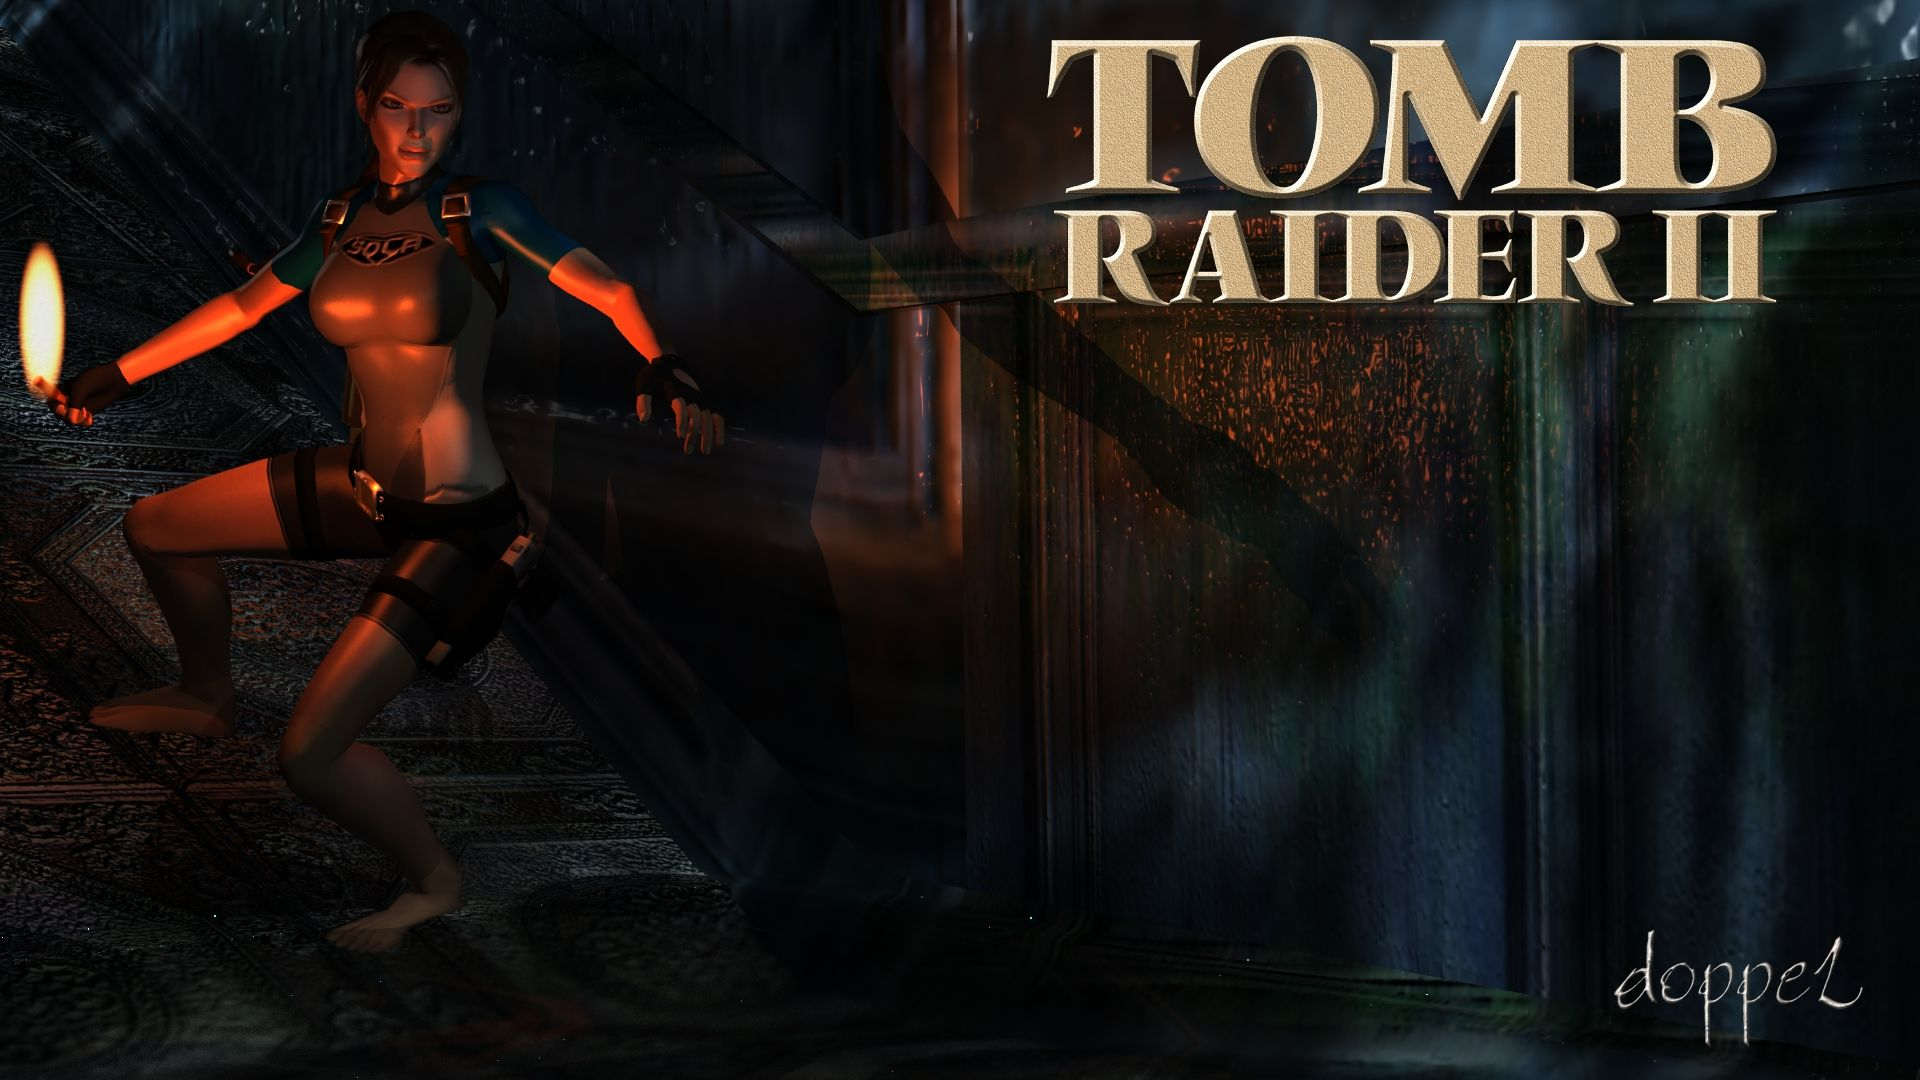 Tomb Raider 2 Remake Maria Do By Doppel Zgz On Deviantart Tomb